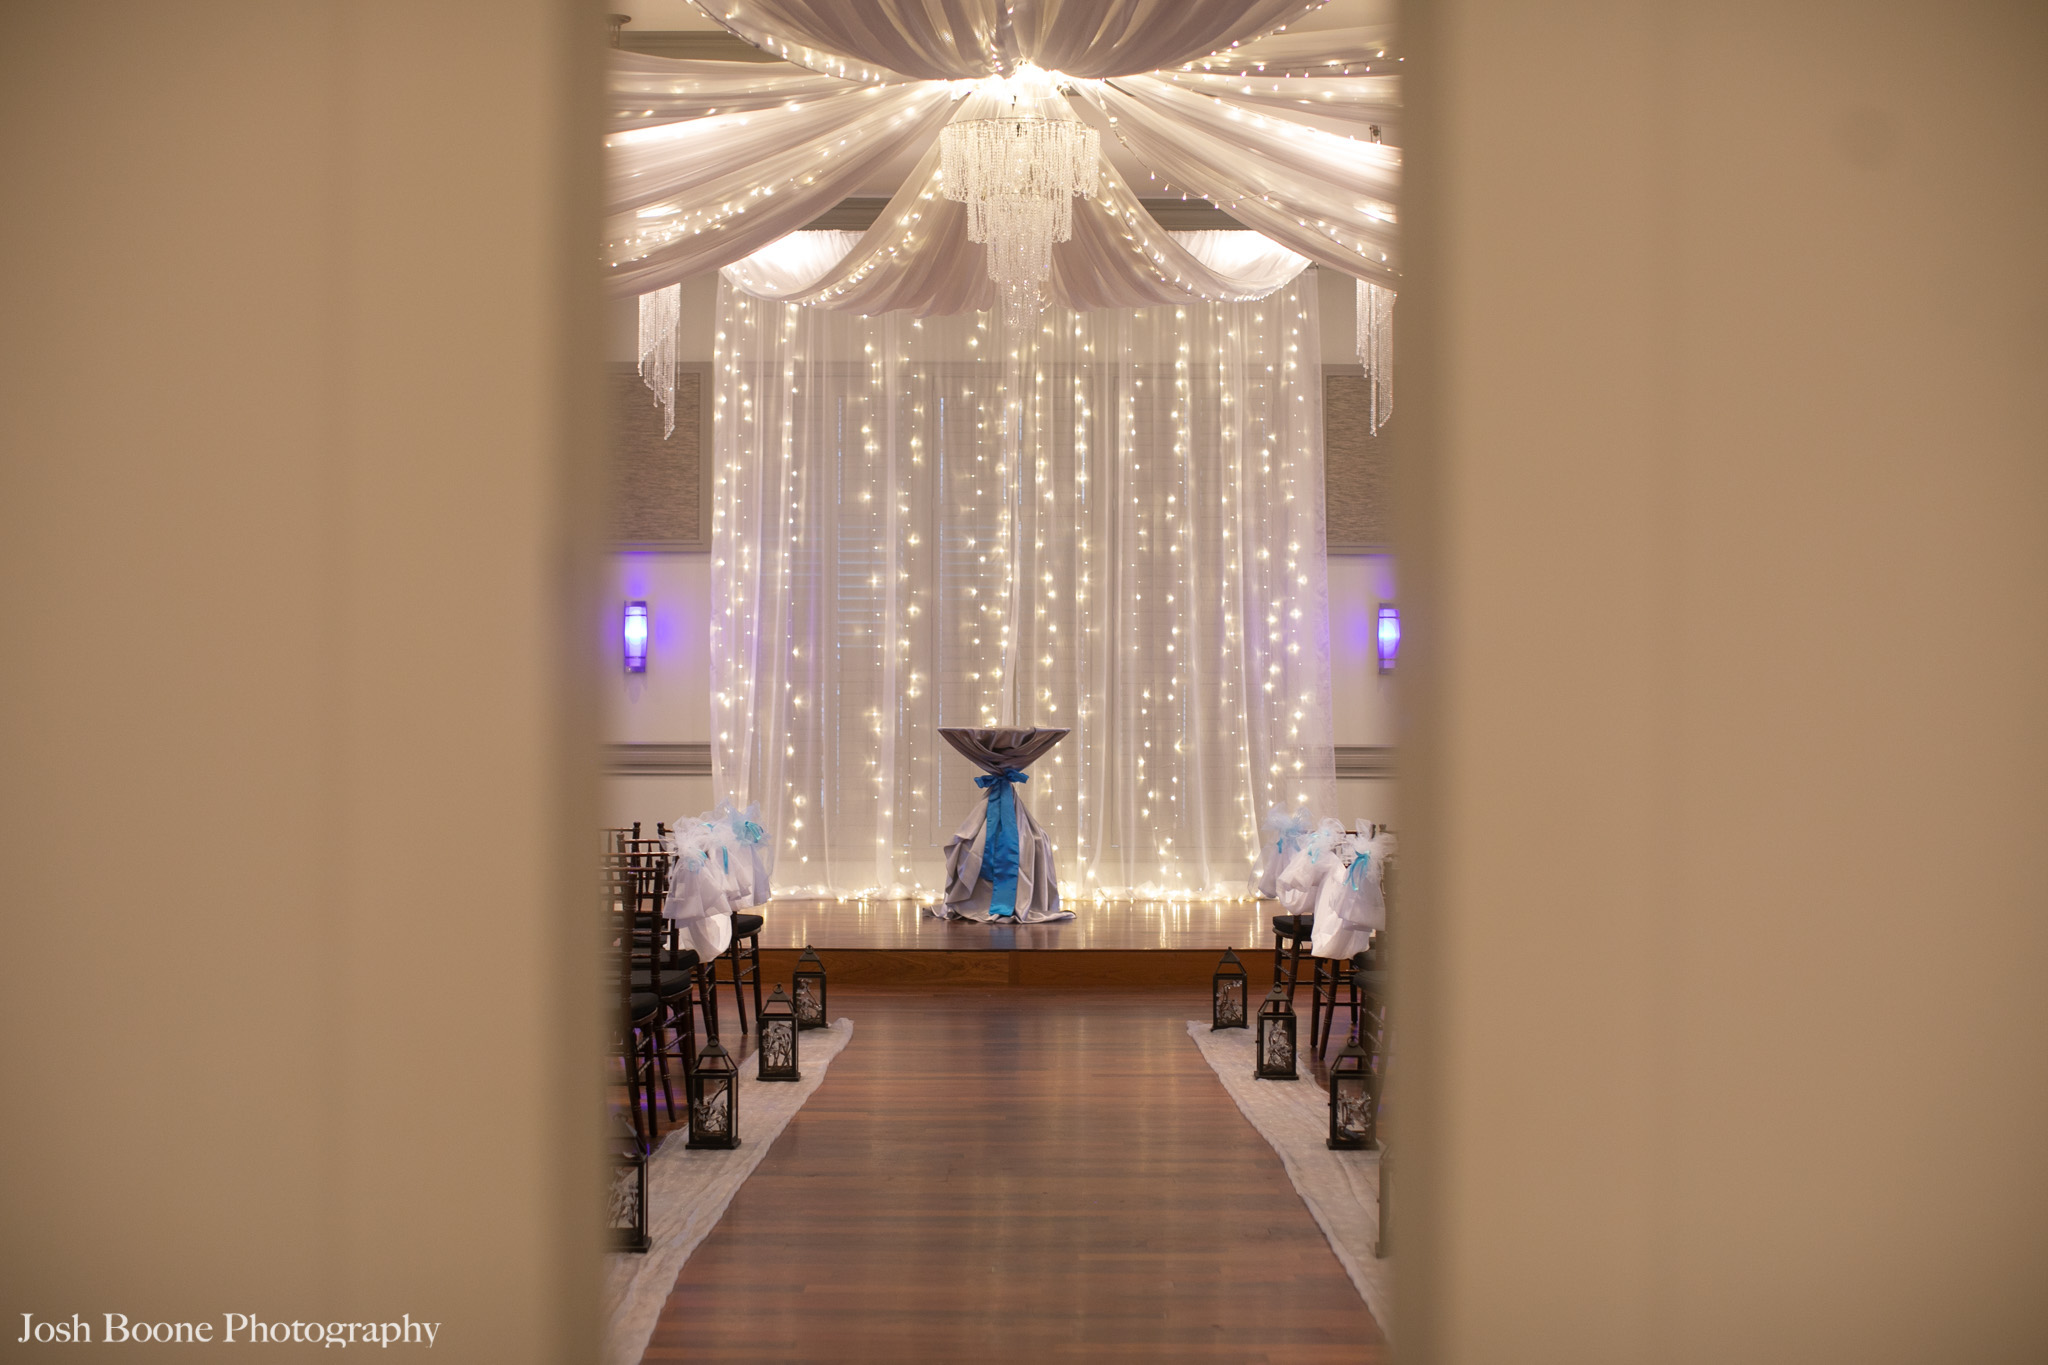 noahs_event_venue_wedding-28.jpg